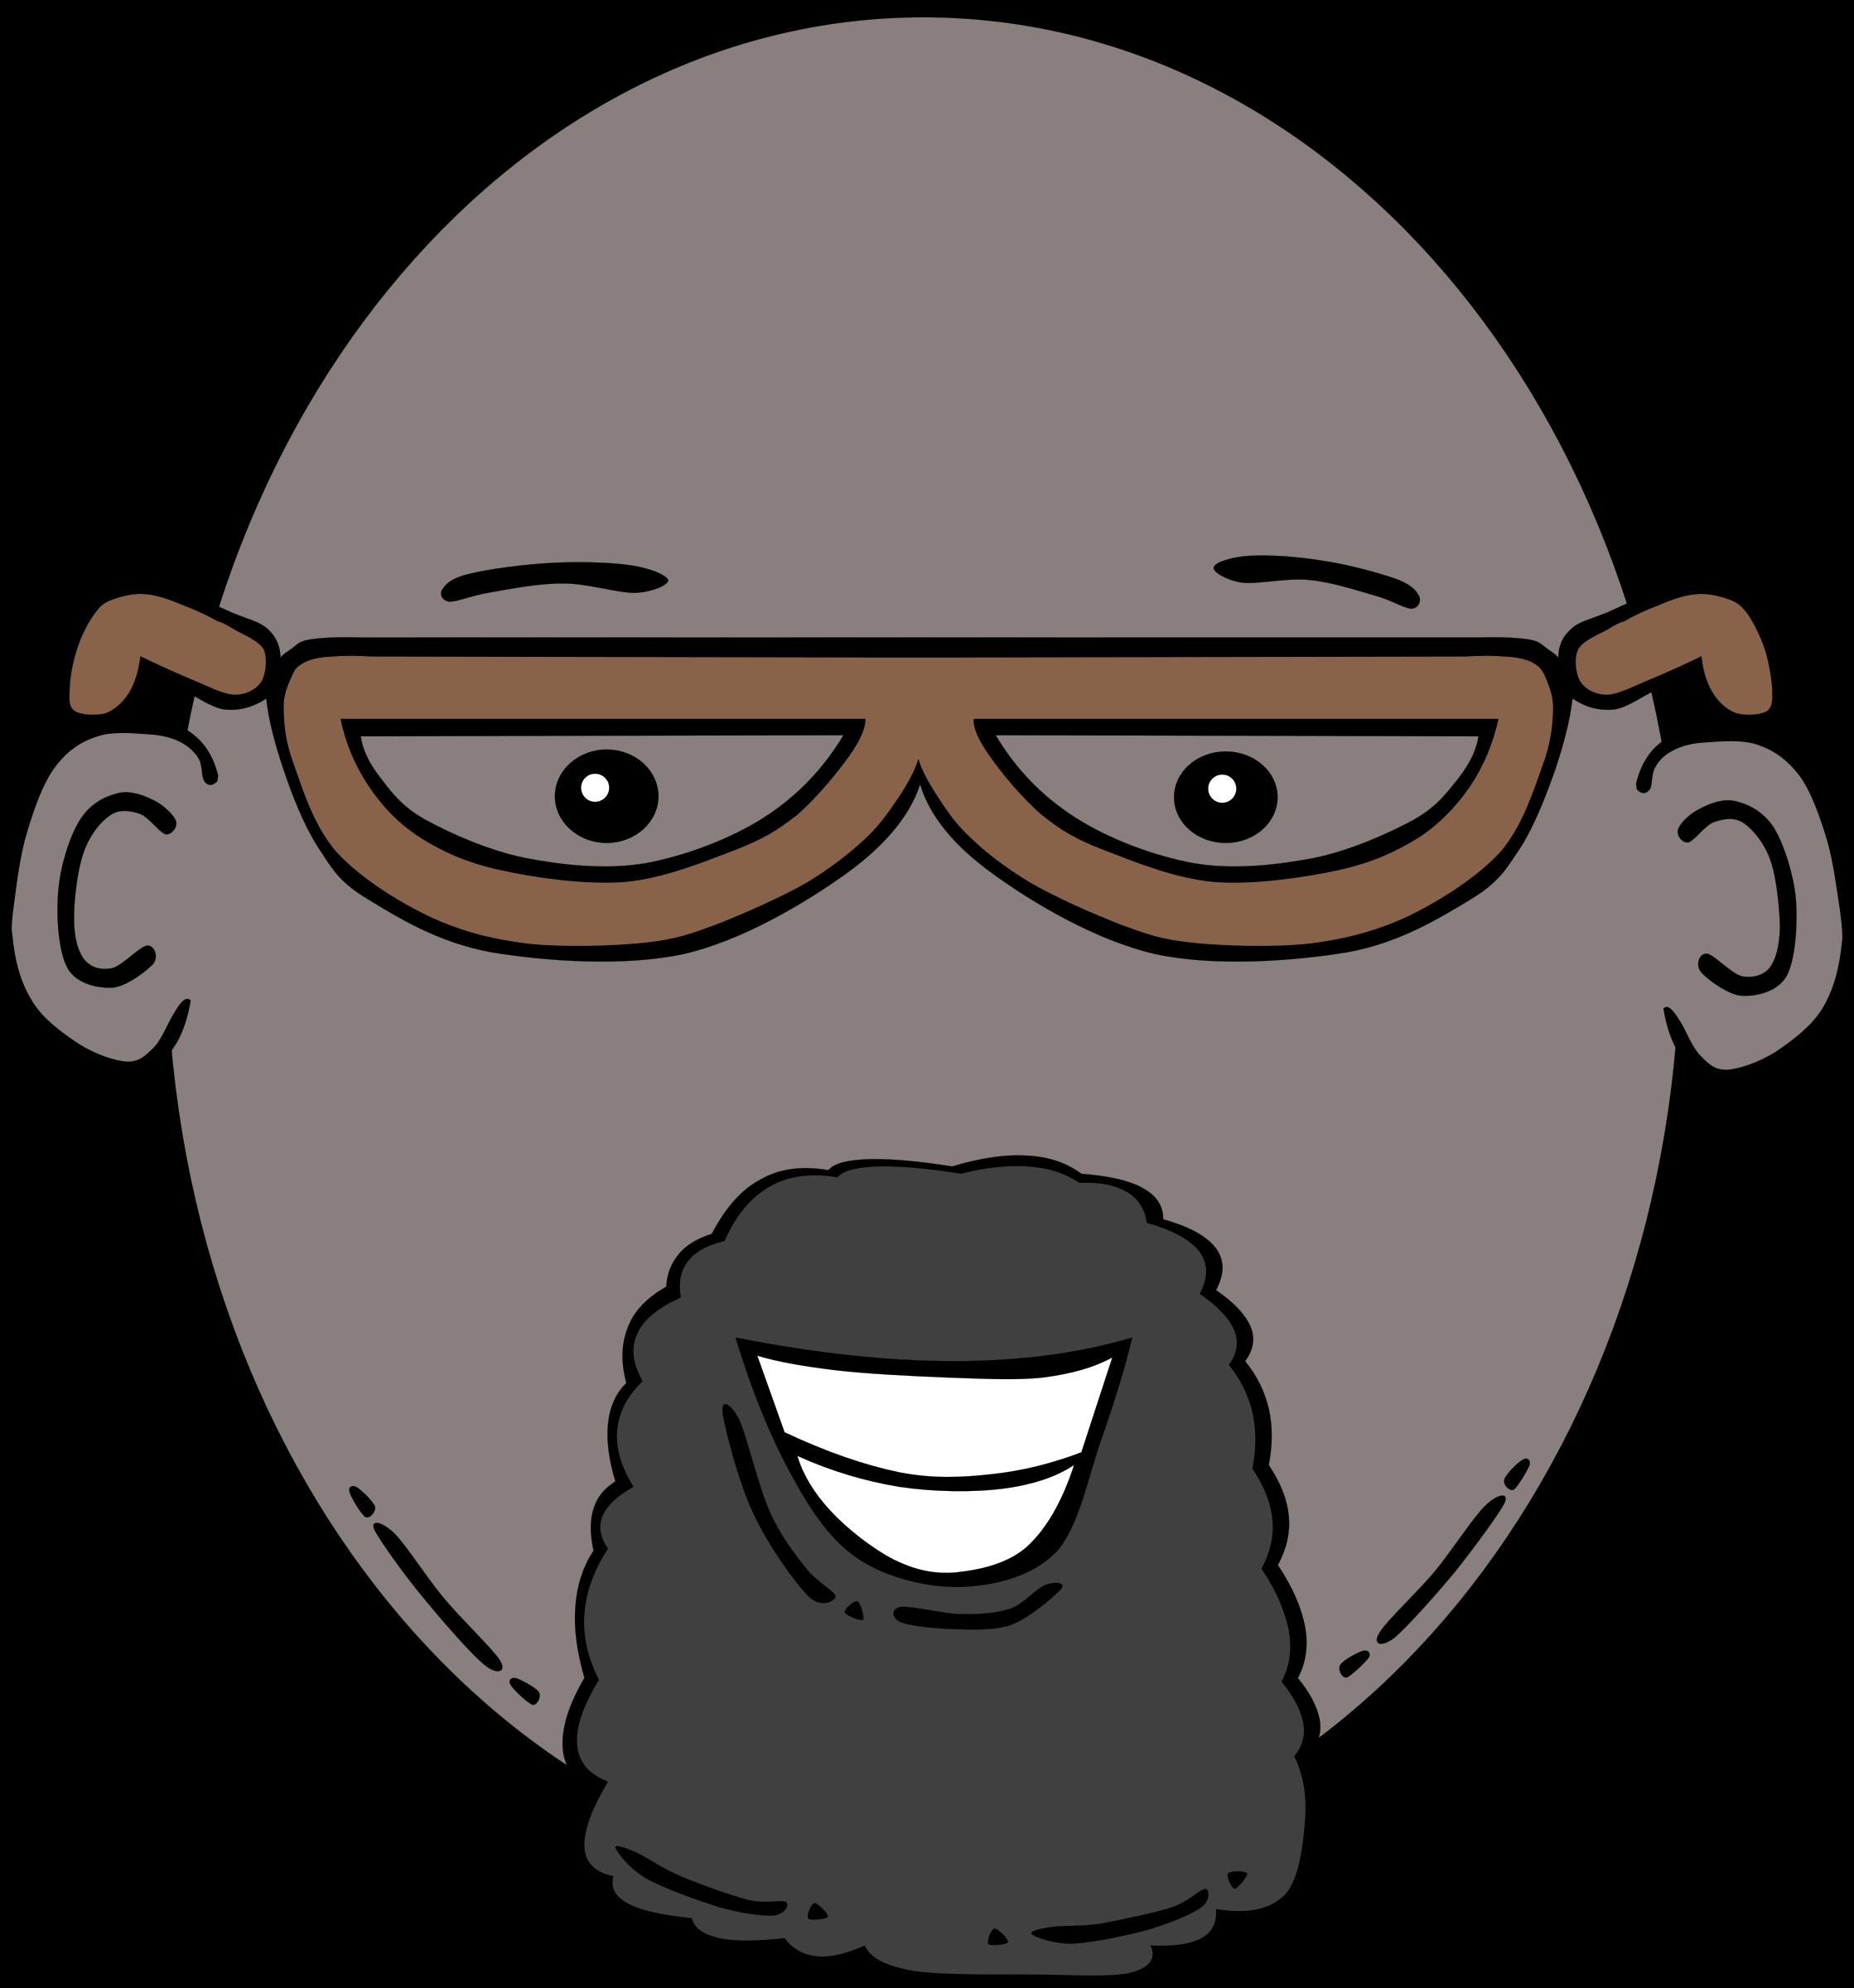 image transparent library Beard clipart goatee. Man face cartoon big